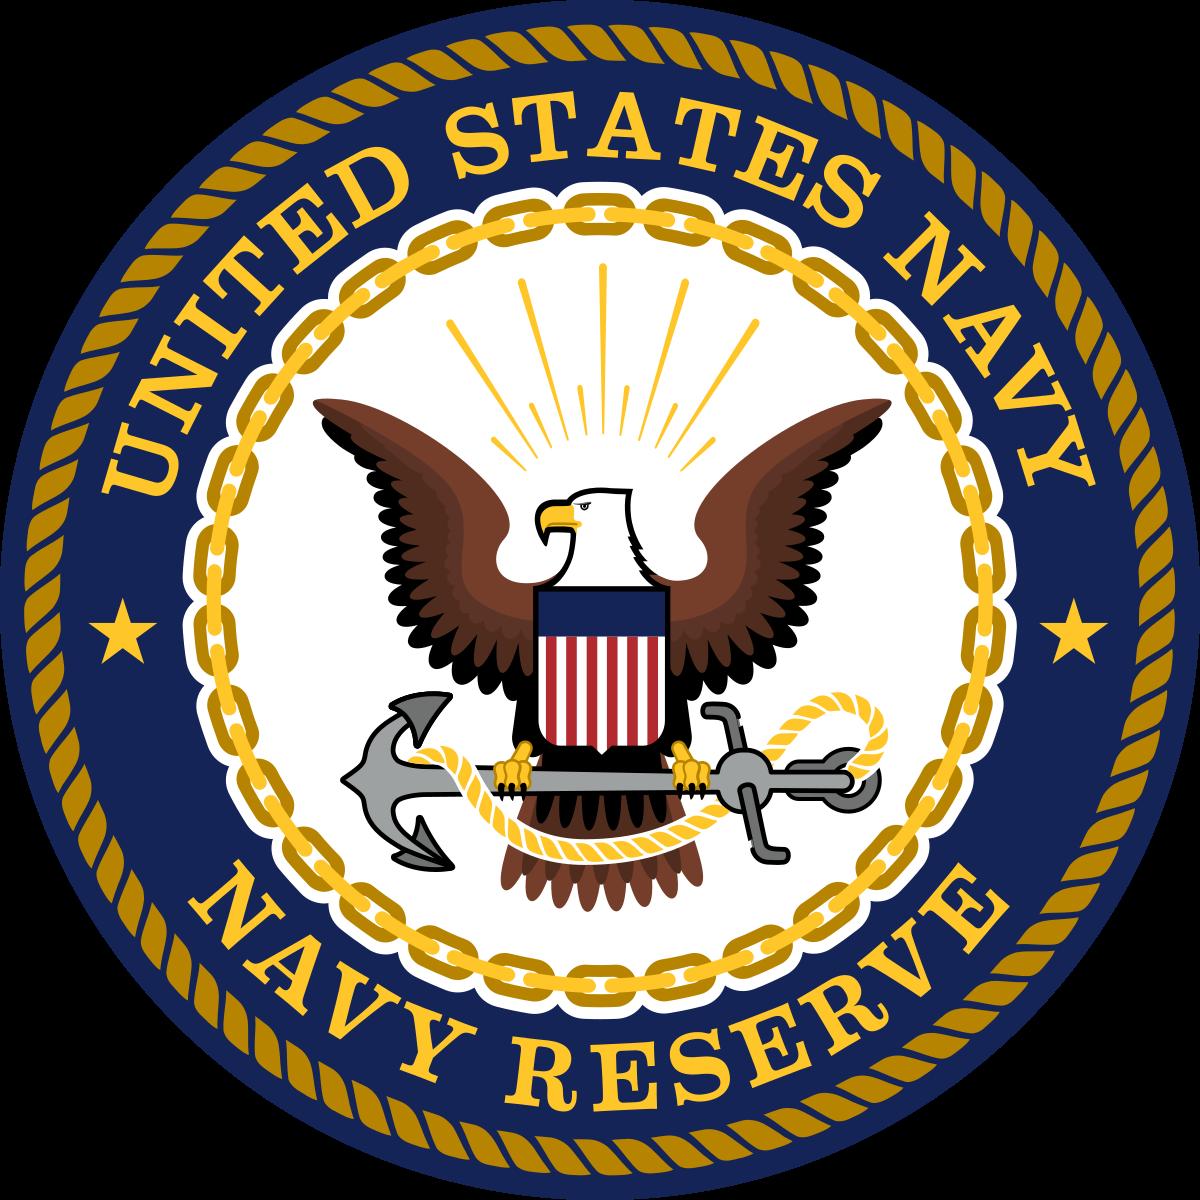 Clipart anchor seaman logo. United states navy reserve